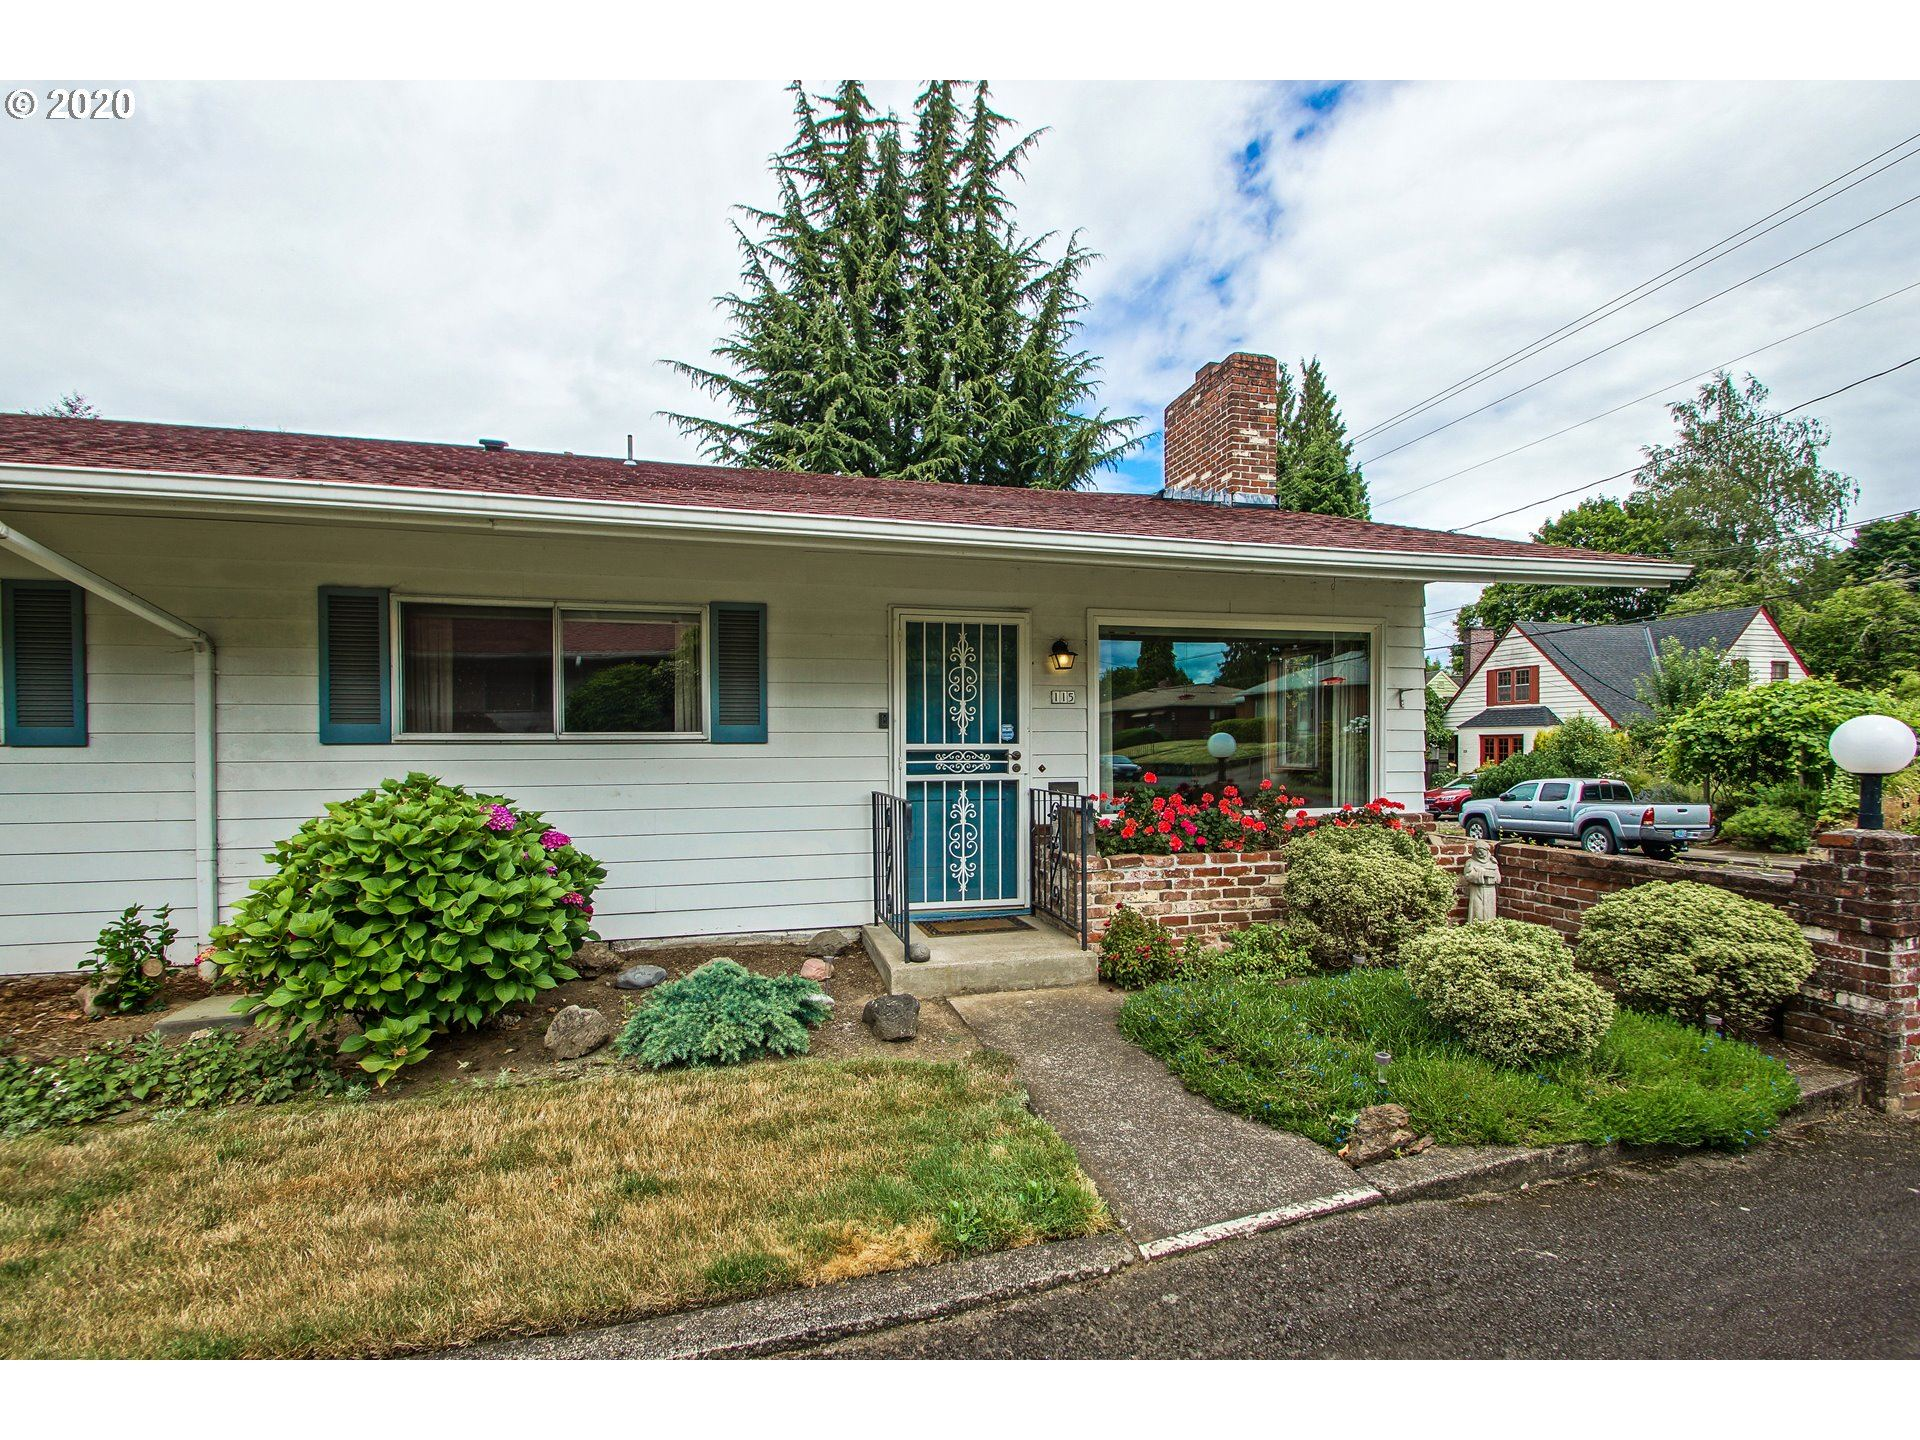 115 SE 52ND AVE, Portland, OR 97215 - MLS#: 20039453